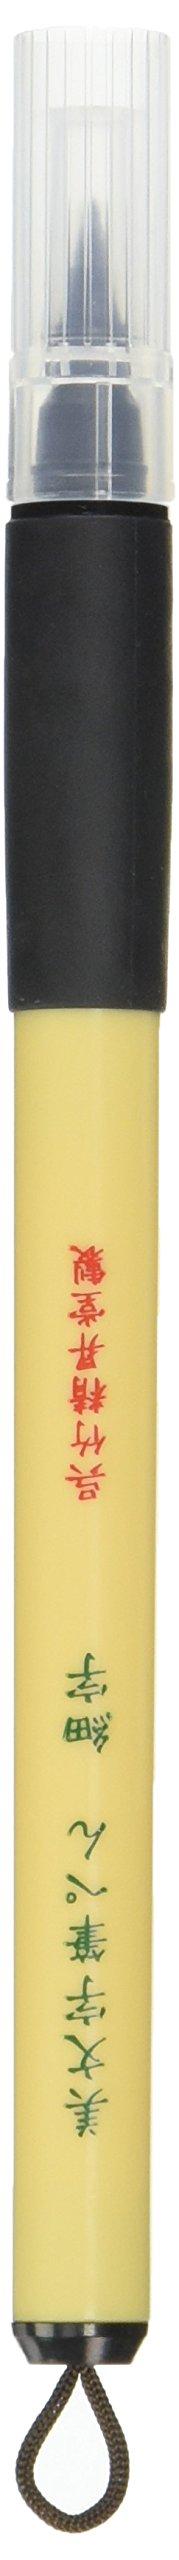 Kuretake Bimoji Felt Tip Brush Pen with Special Grip...